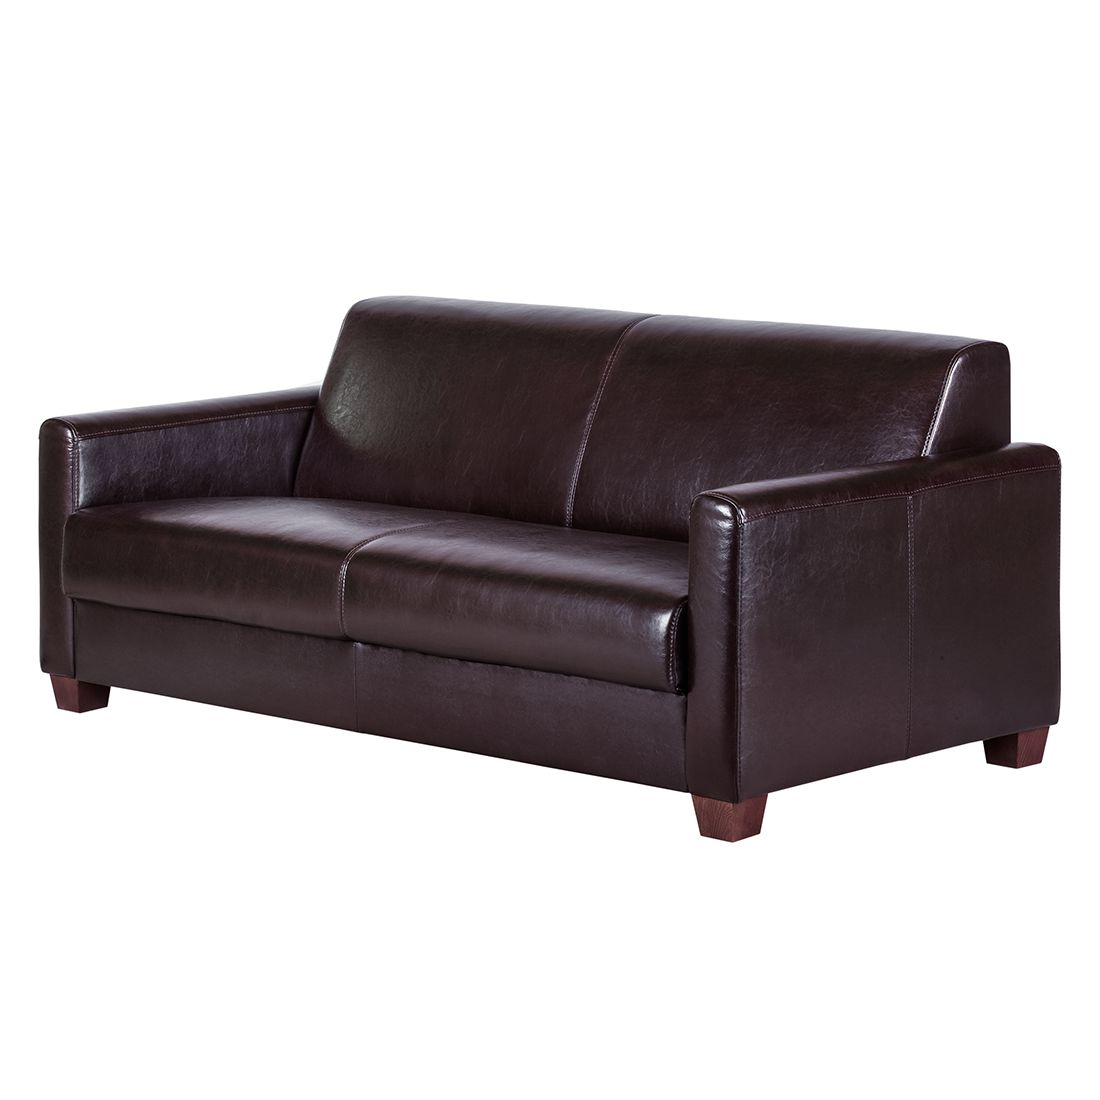 sofa fragola 3 sitzer echtleder dunkelbraun ars manufacti g nstig kaufen. Black Bedroom Furniture Sets. Home Design Ideas